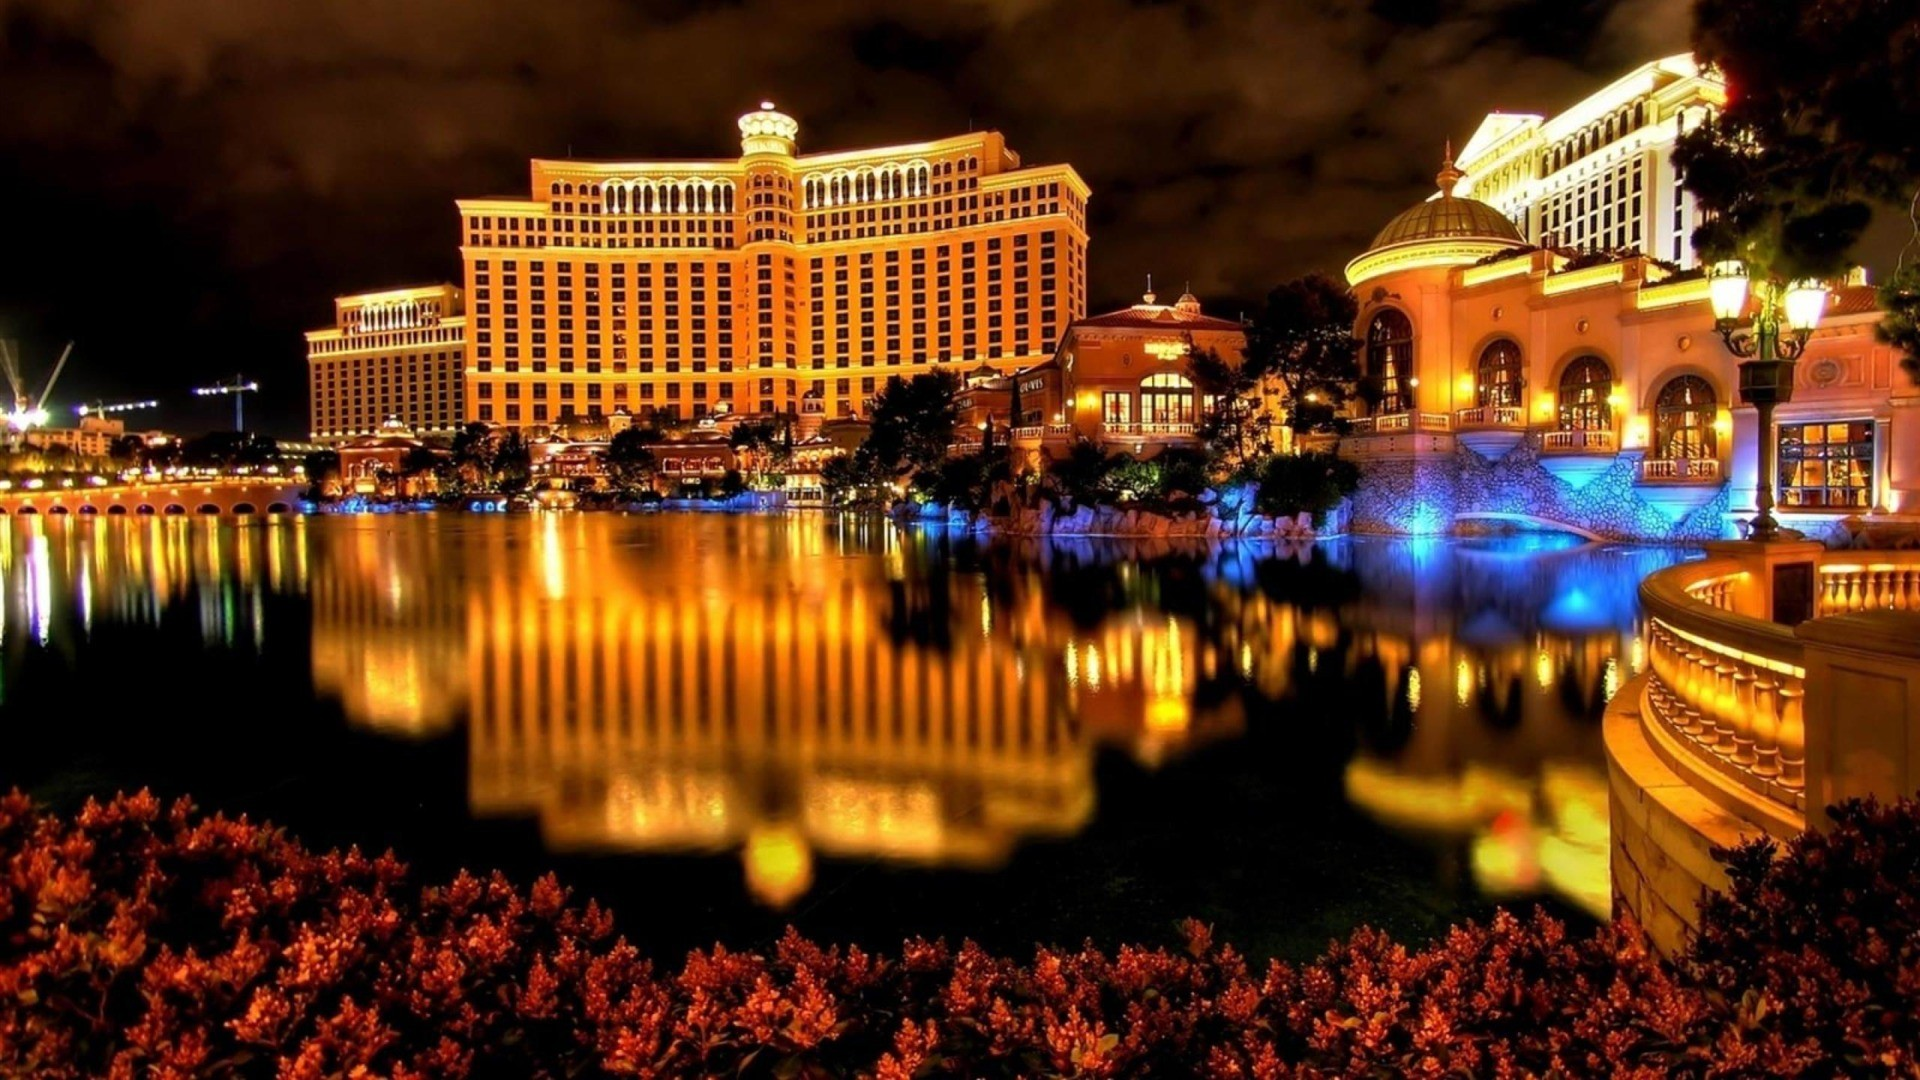 Las Vegas Wallpaper Download Free Beautiful Hd Wallpapers Of